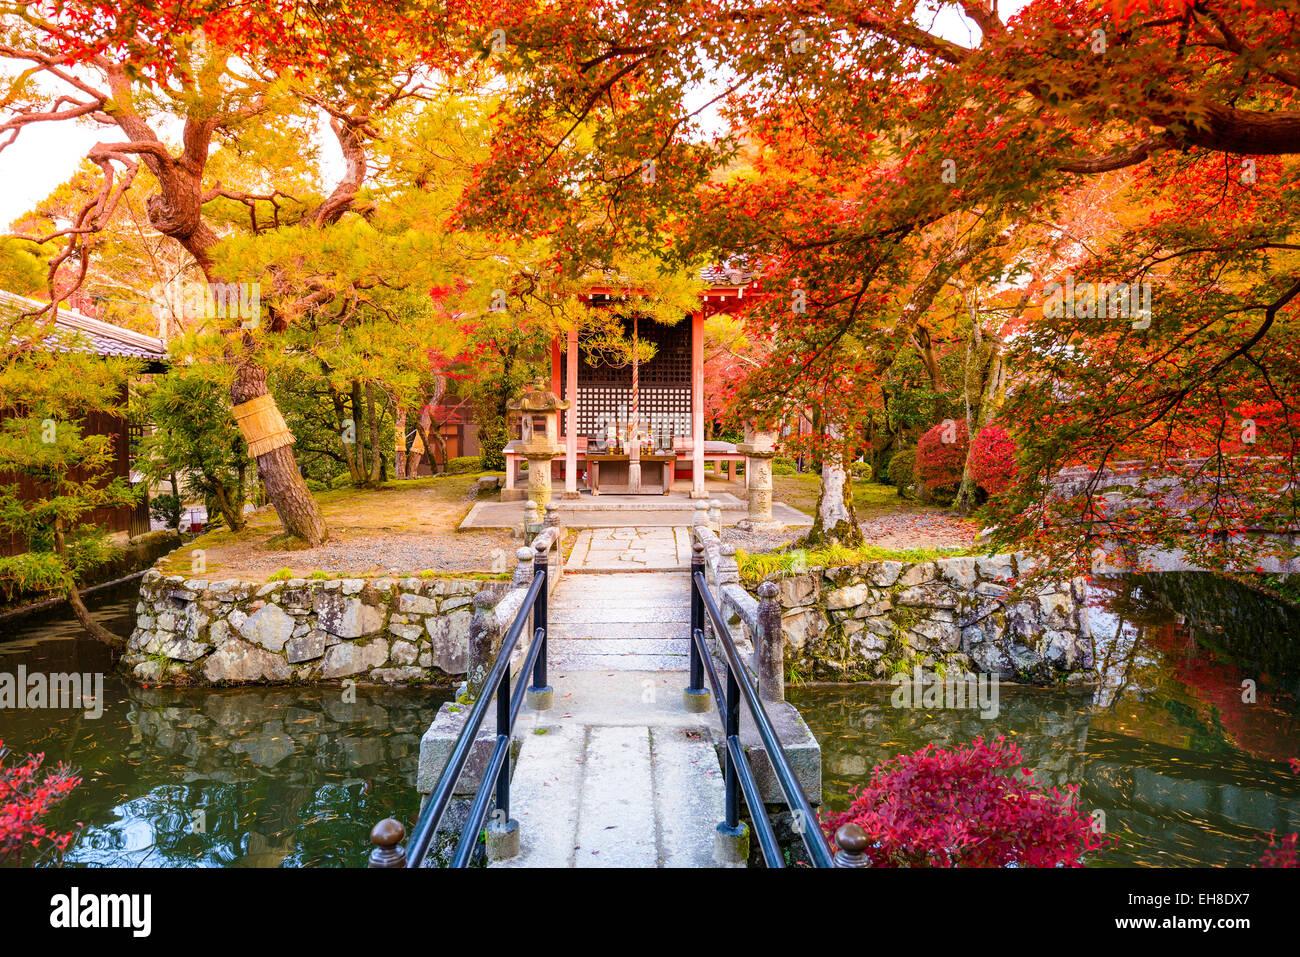 Fall foliage in Kyoto, Japan. Stock Photo